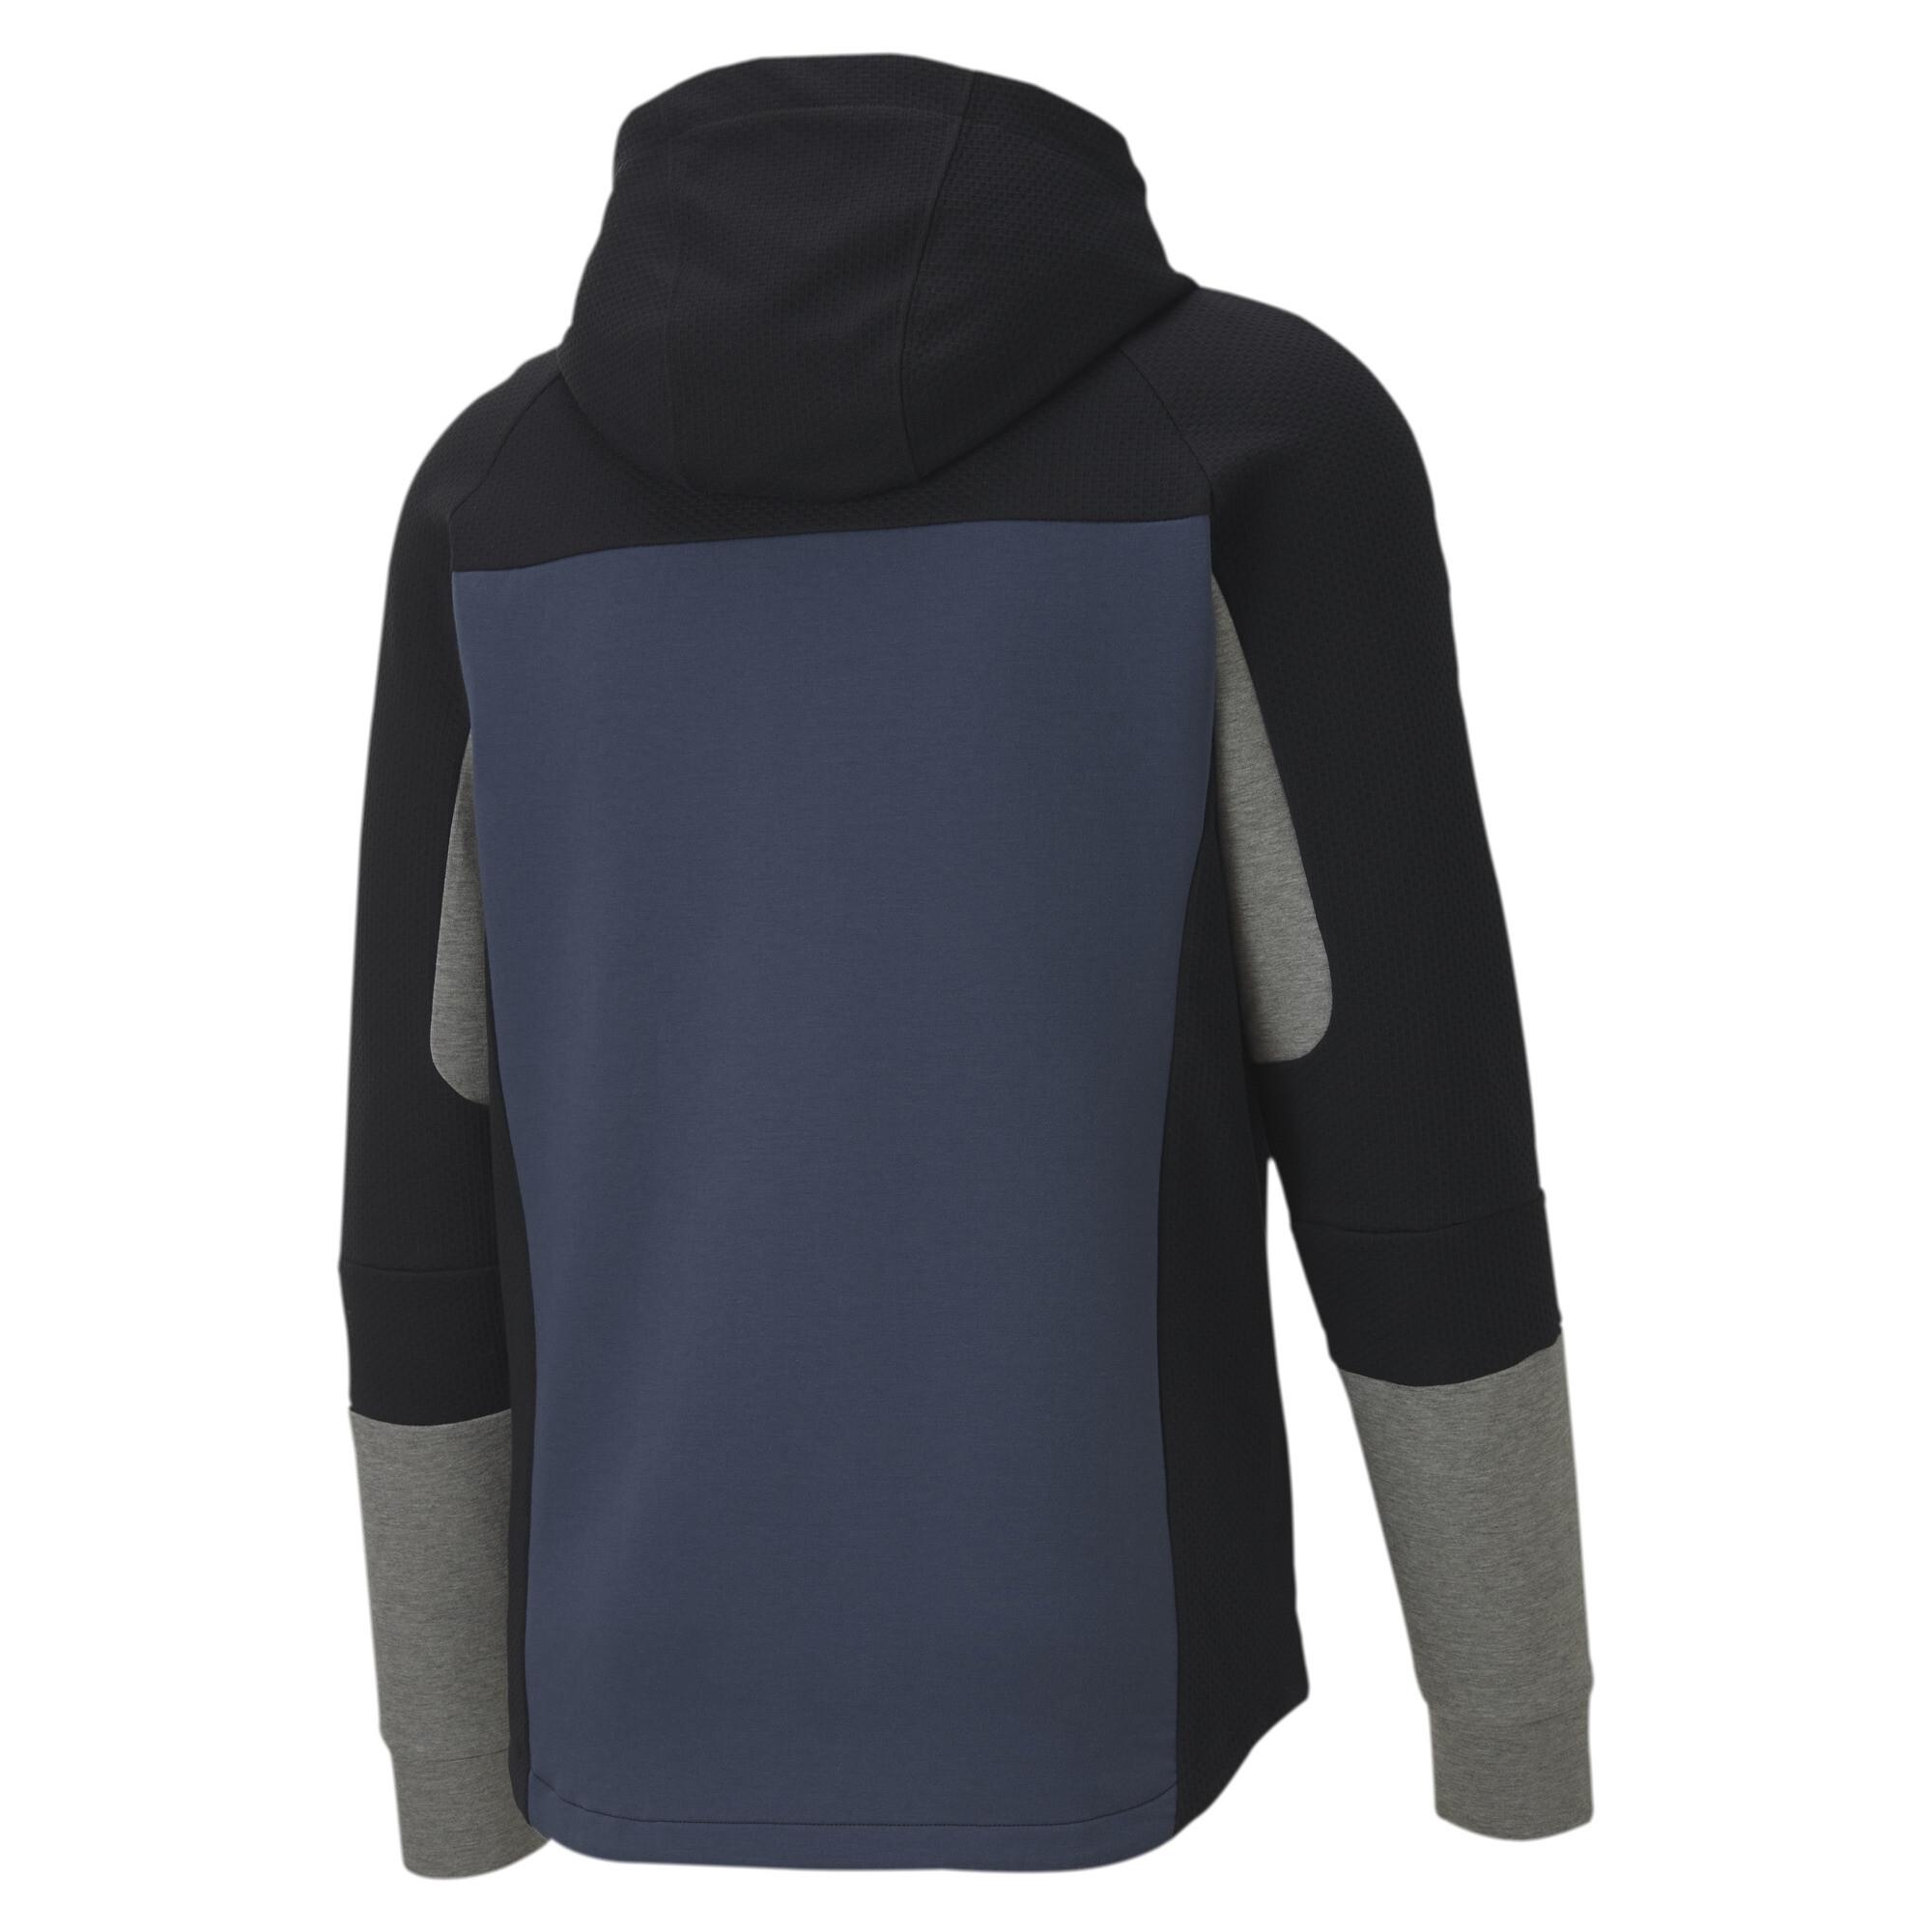 PUMA-Evostripe-Men-039-s-Hooded-Jacket-Men-Sweat-Basics thumbnail 3